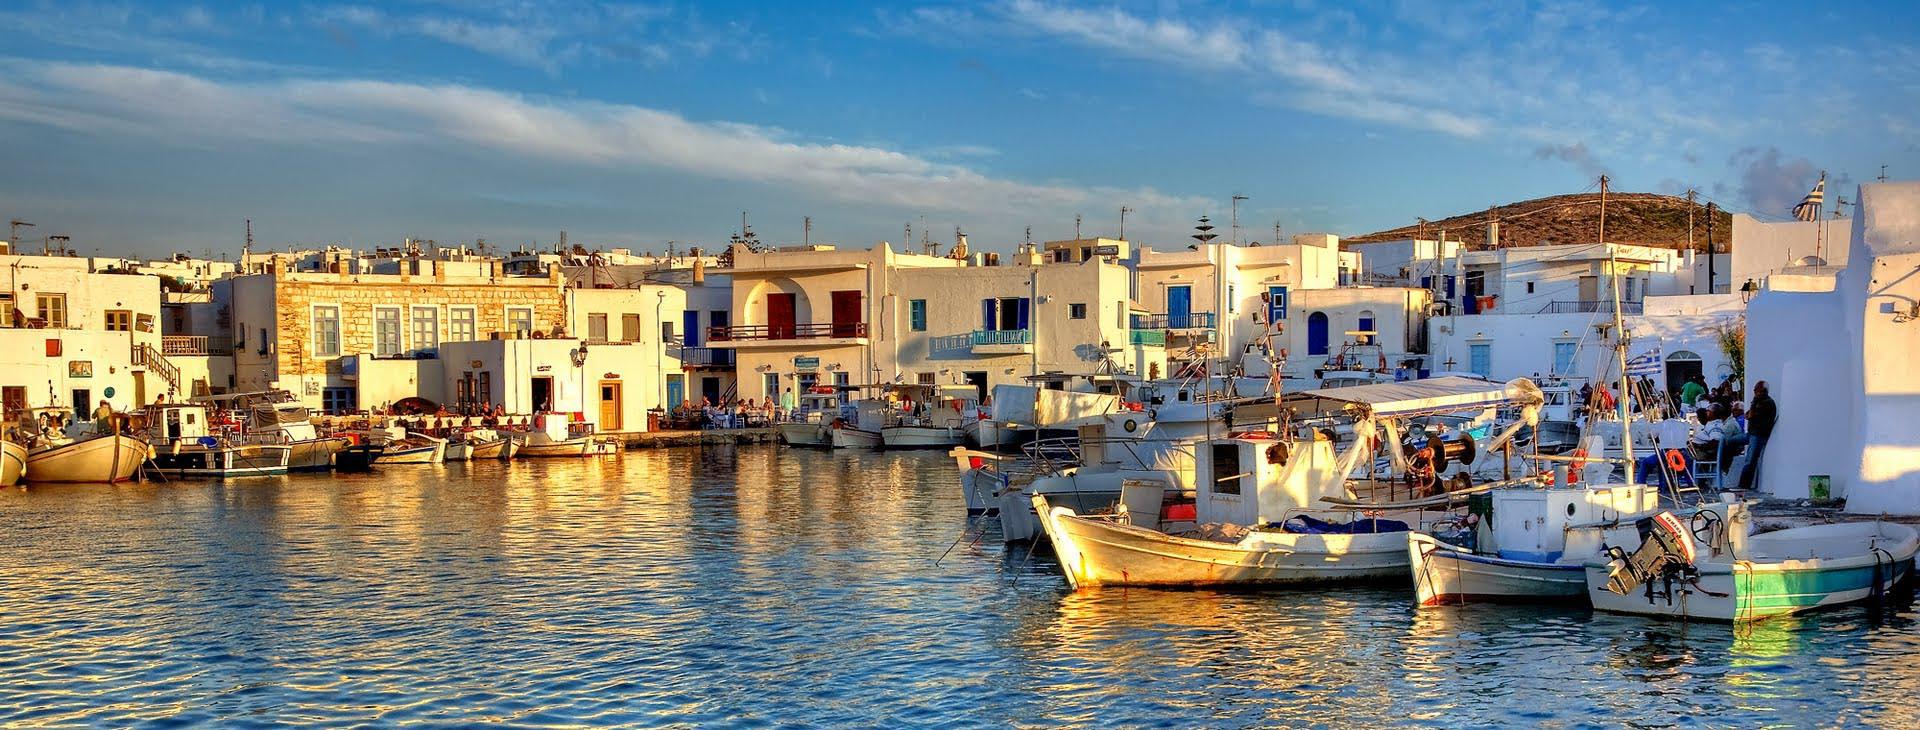 Naousa town at Paros island